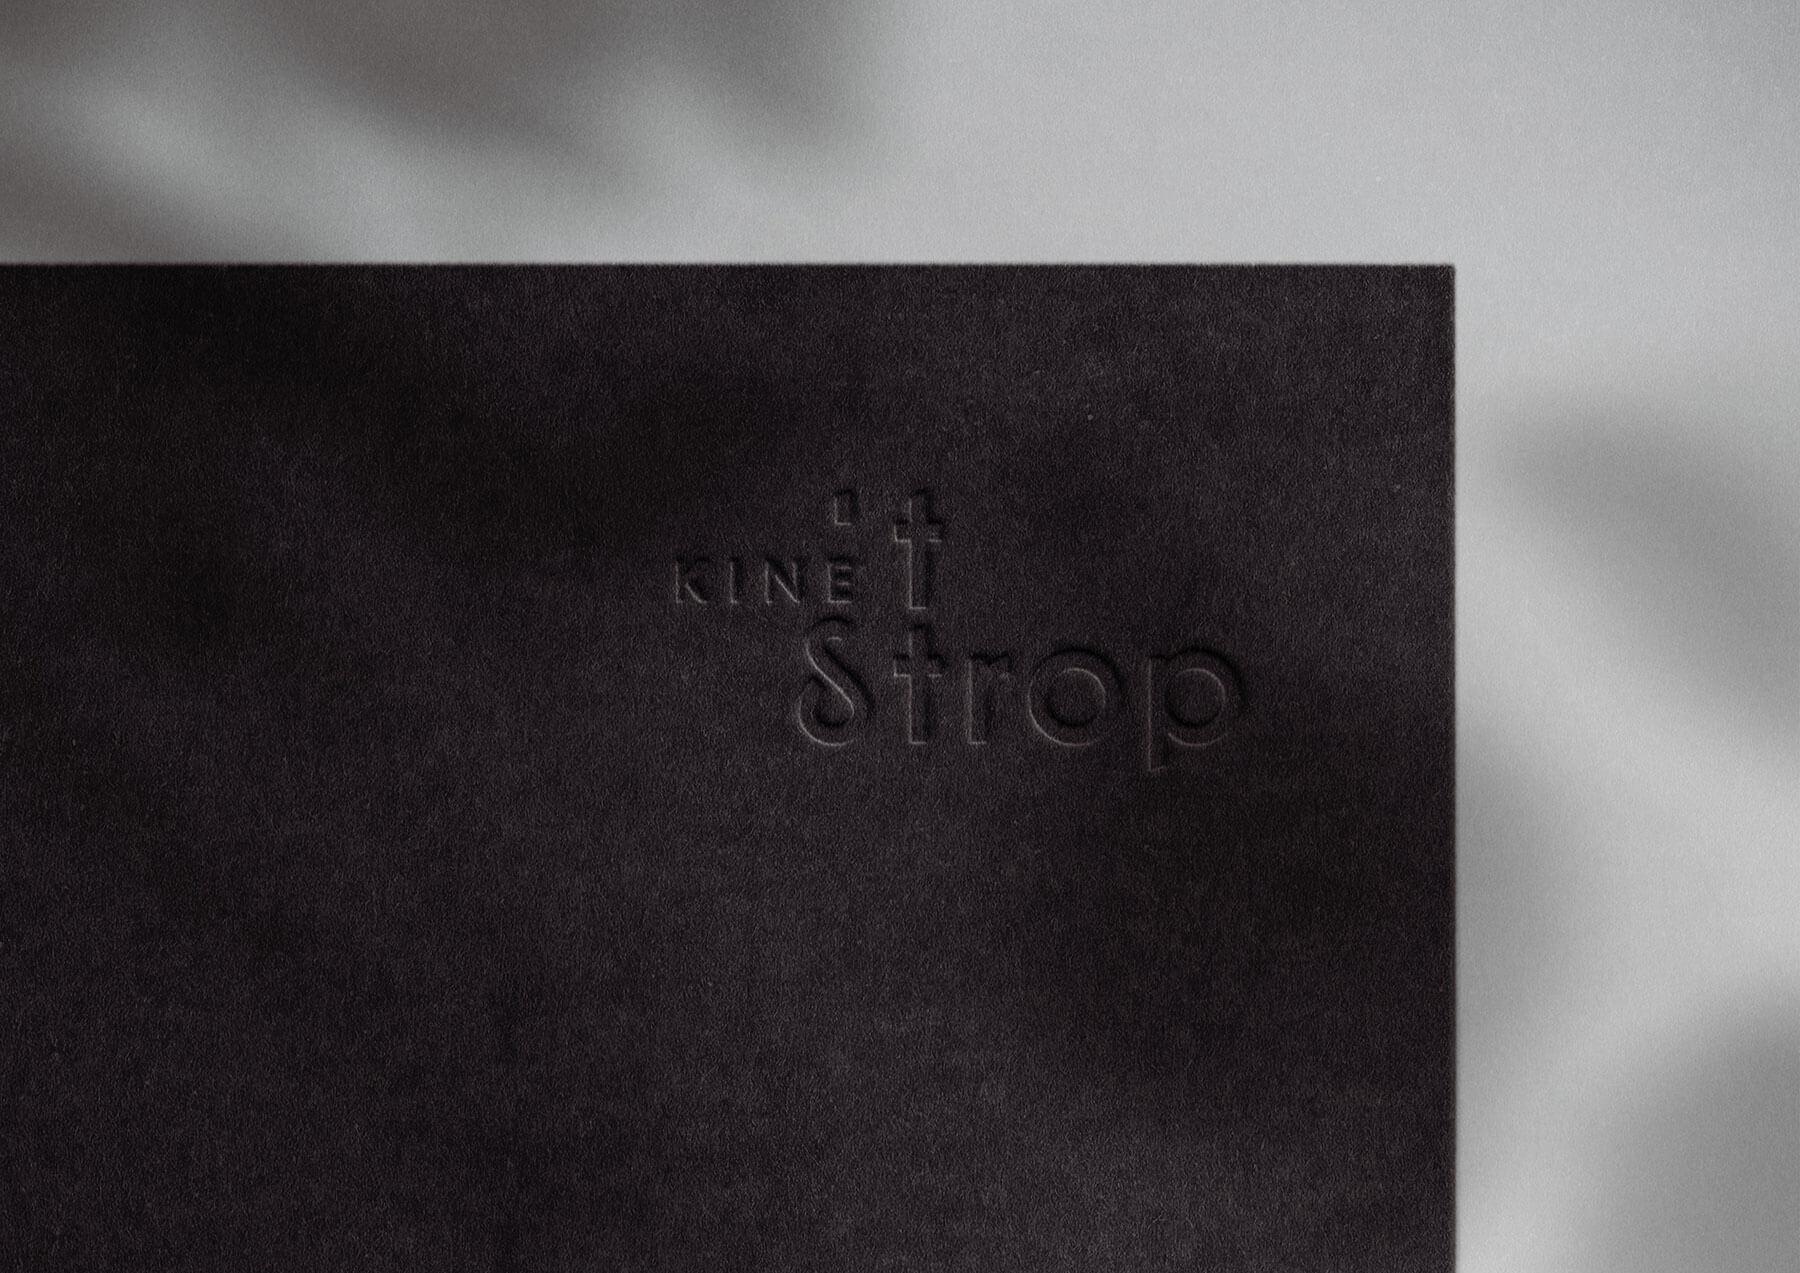 logo kine 't strop